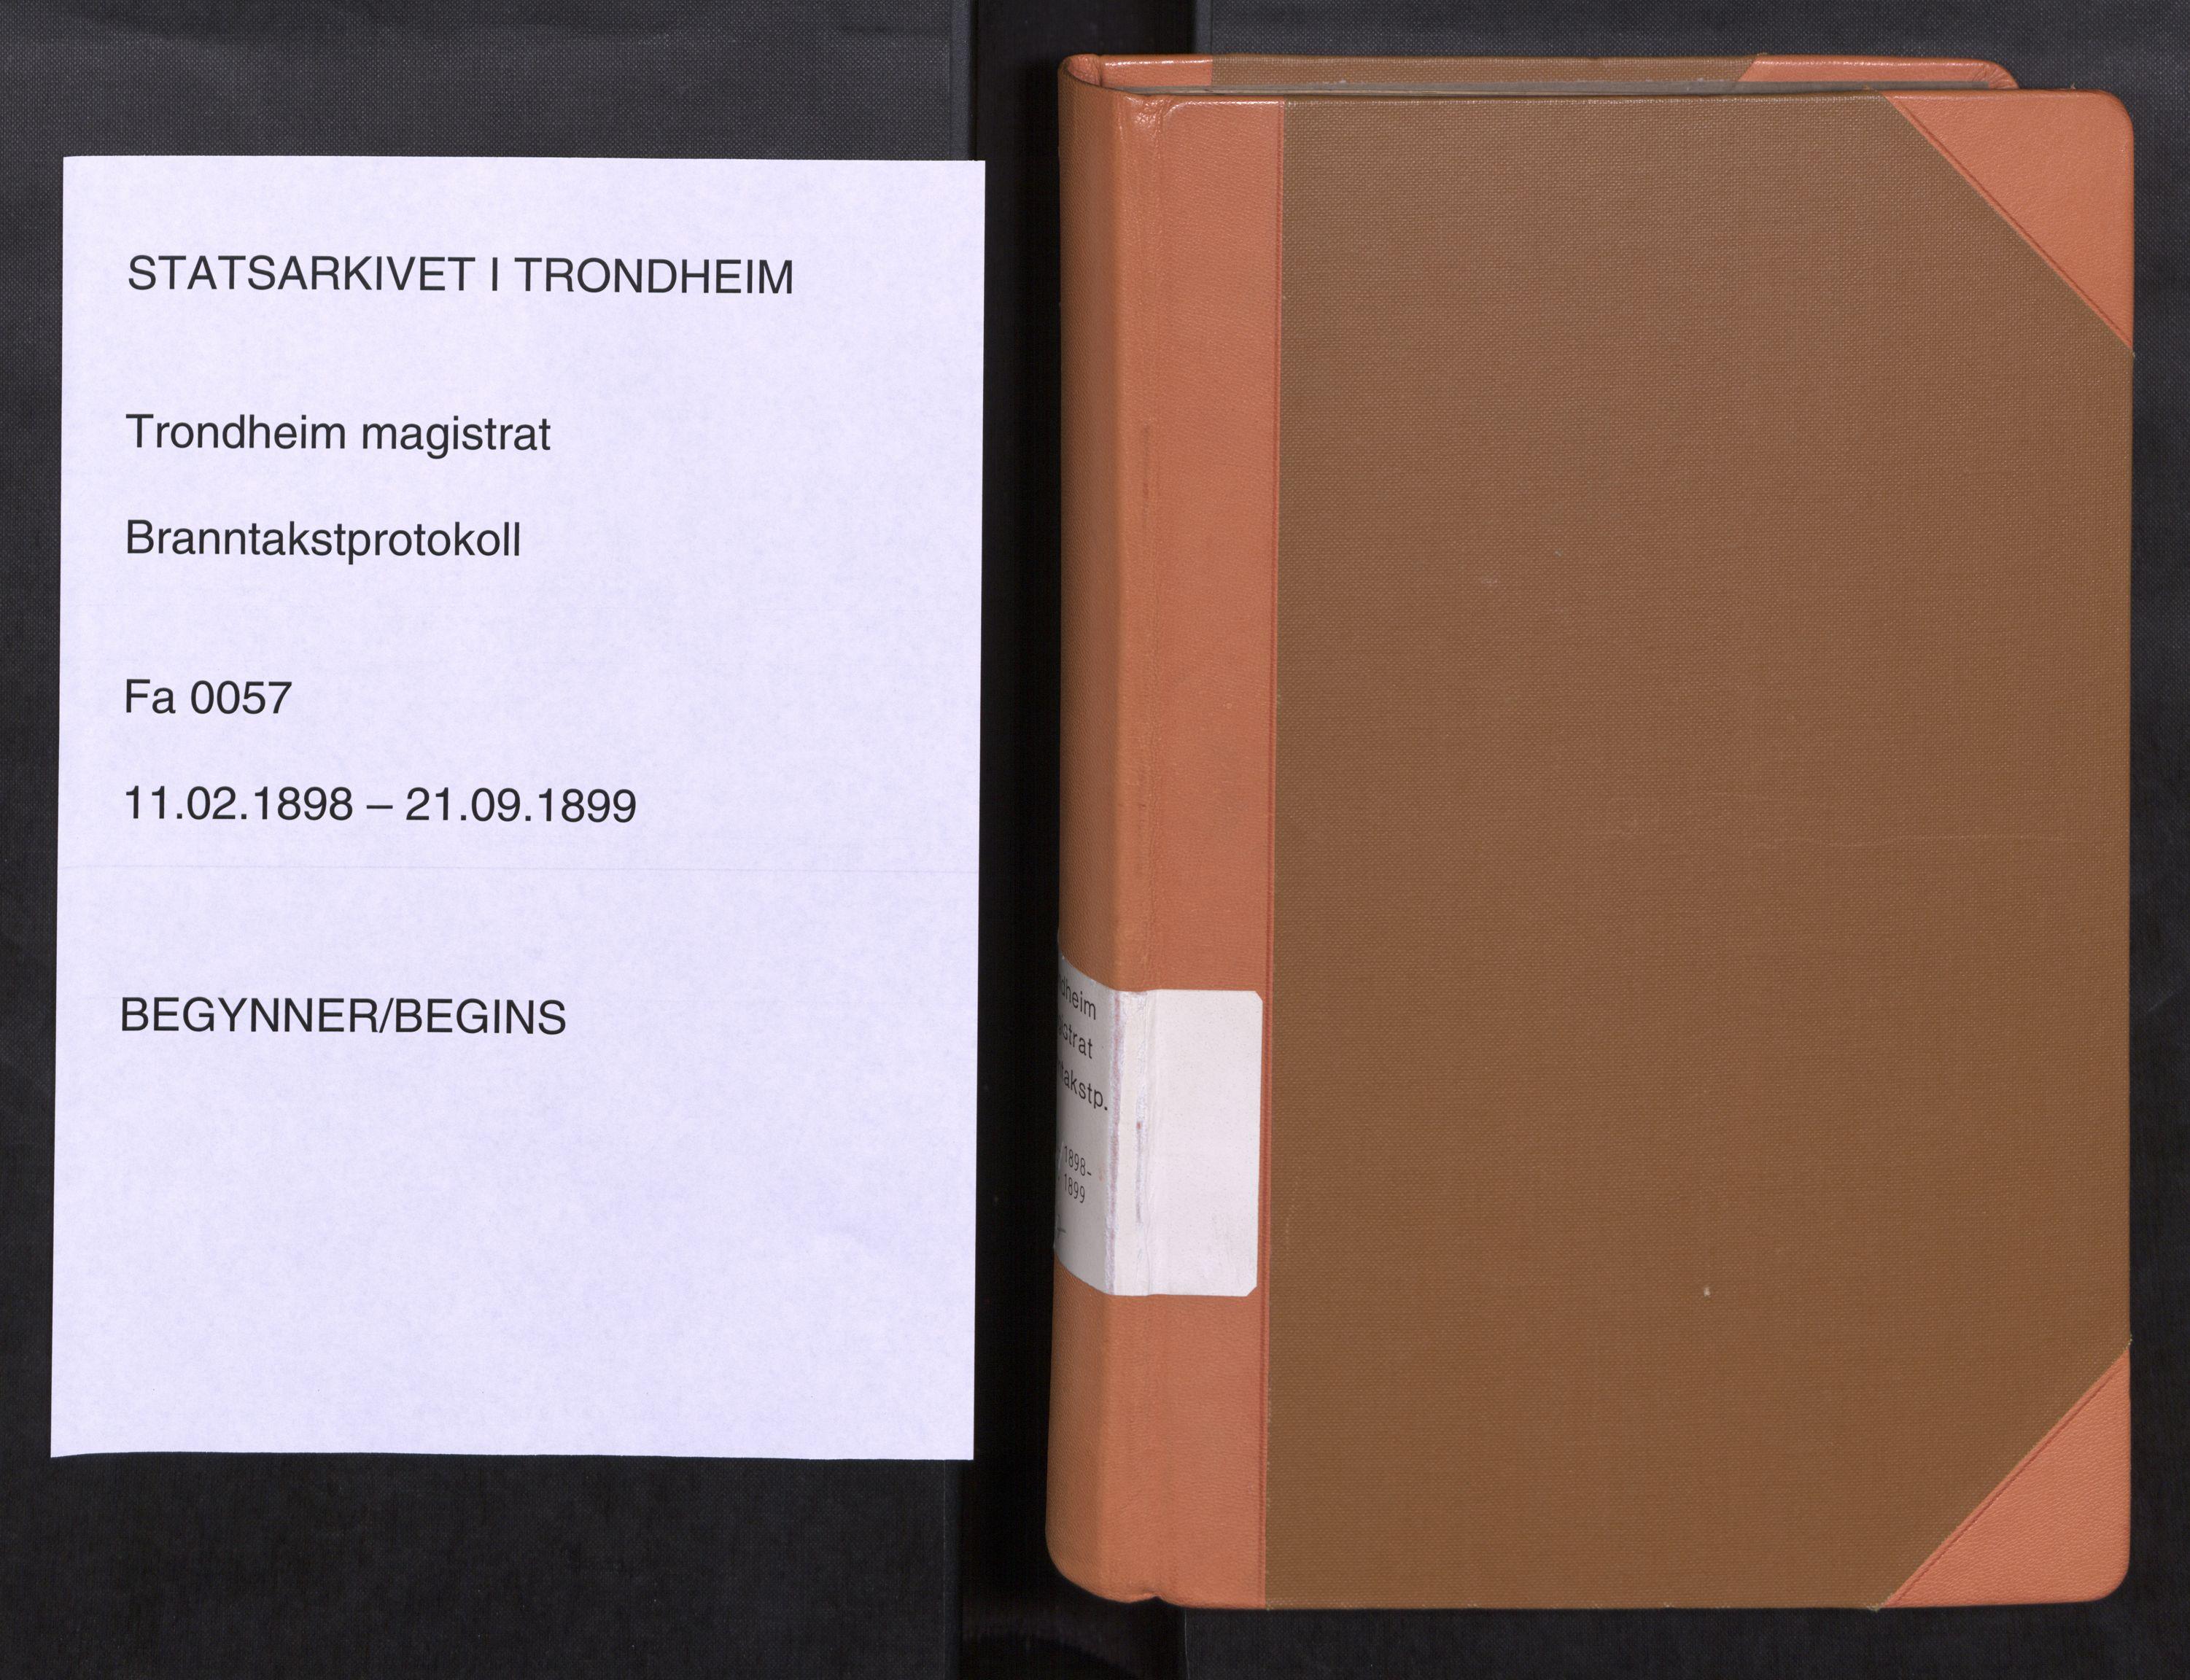 SAT, Norges Brannkasse Trondheim magistrat, Fa/L0061: Branntakstprotokoll Ø, 1898-1899